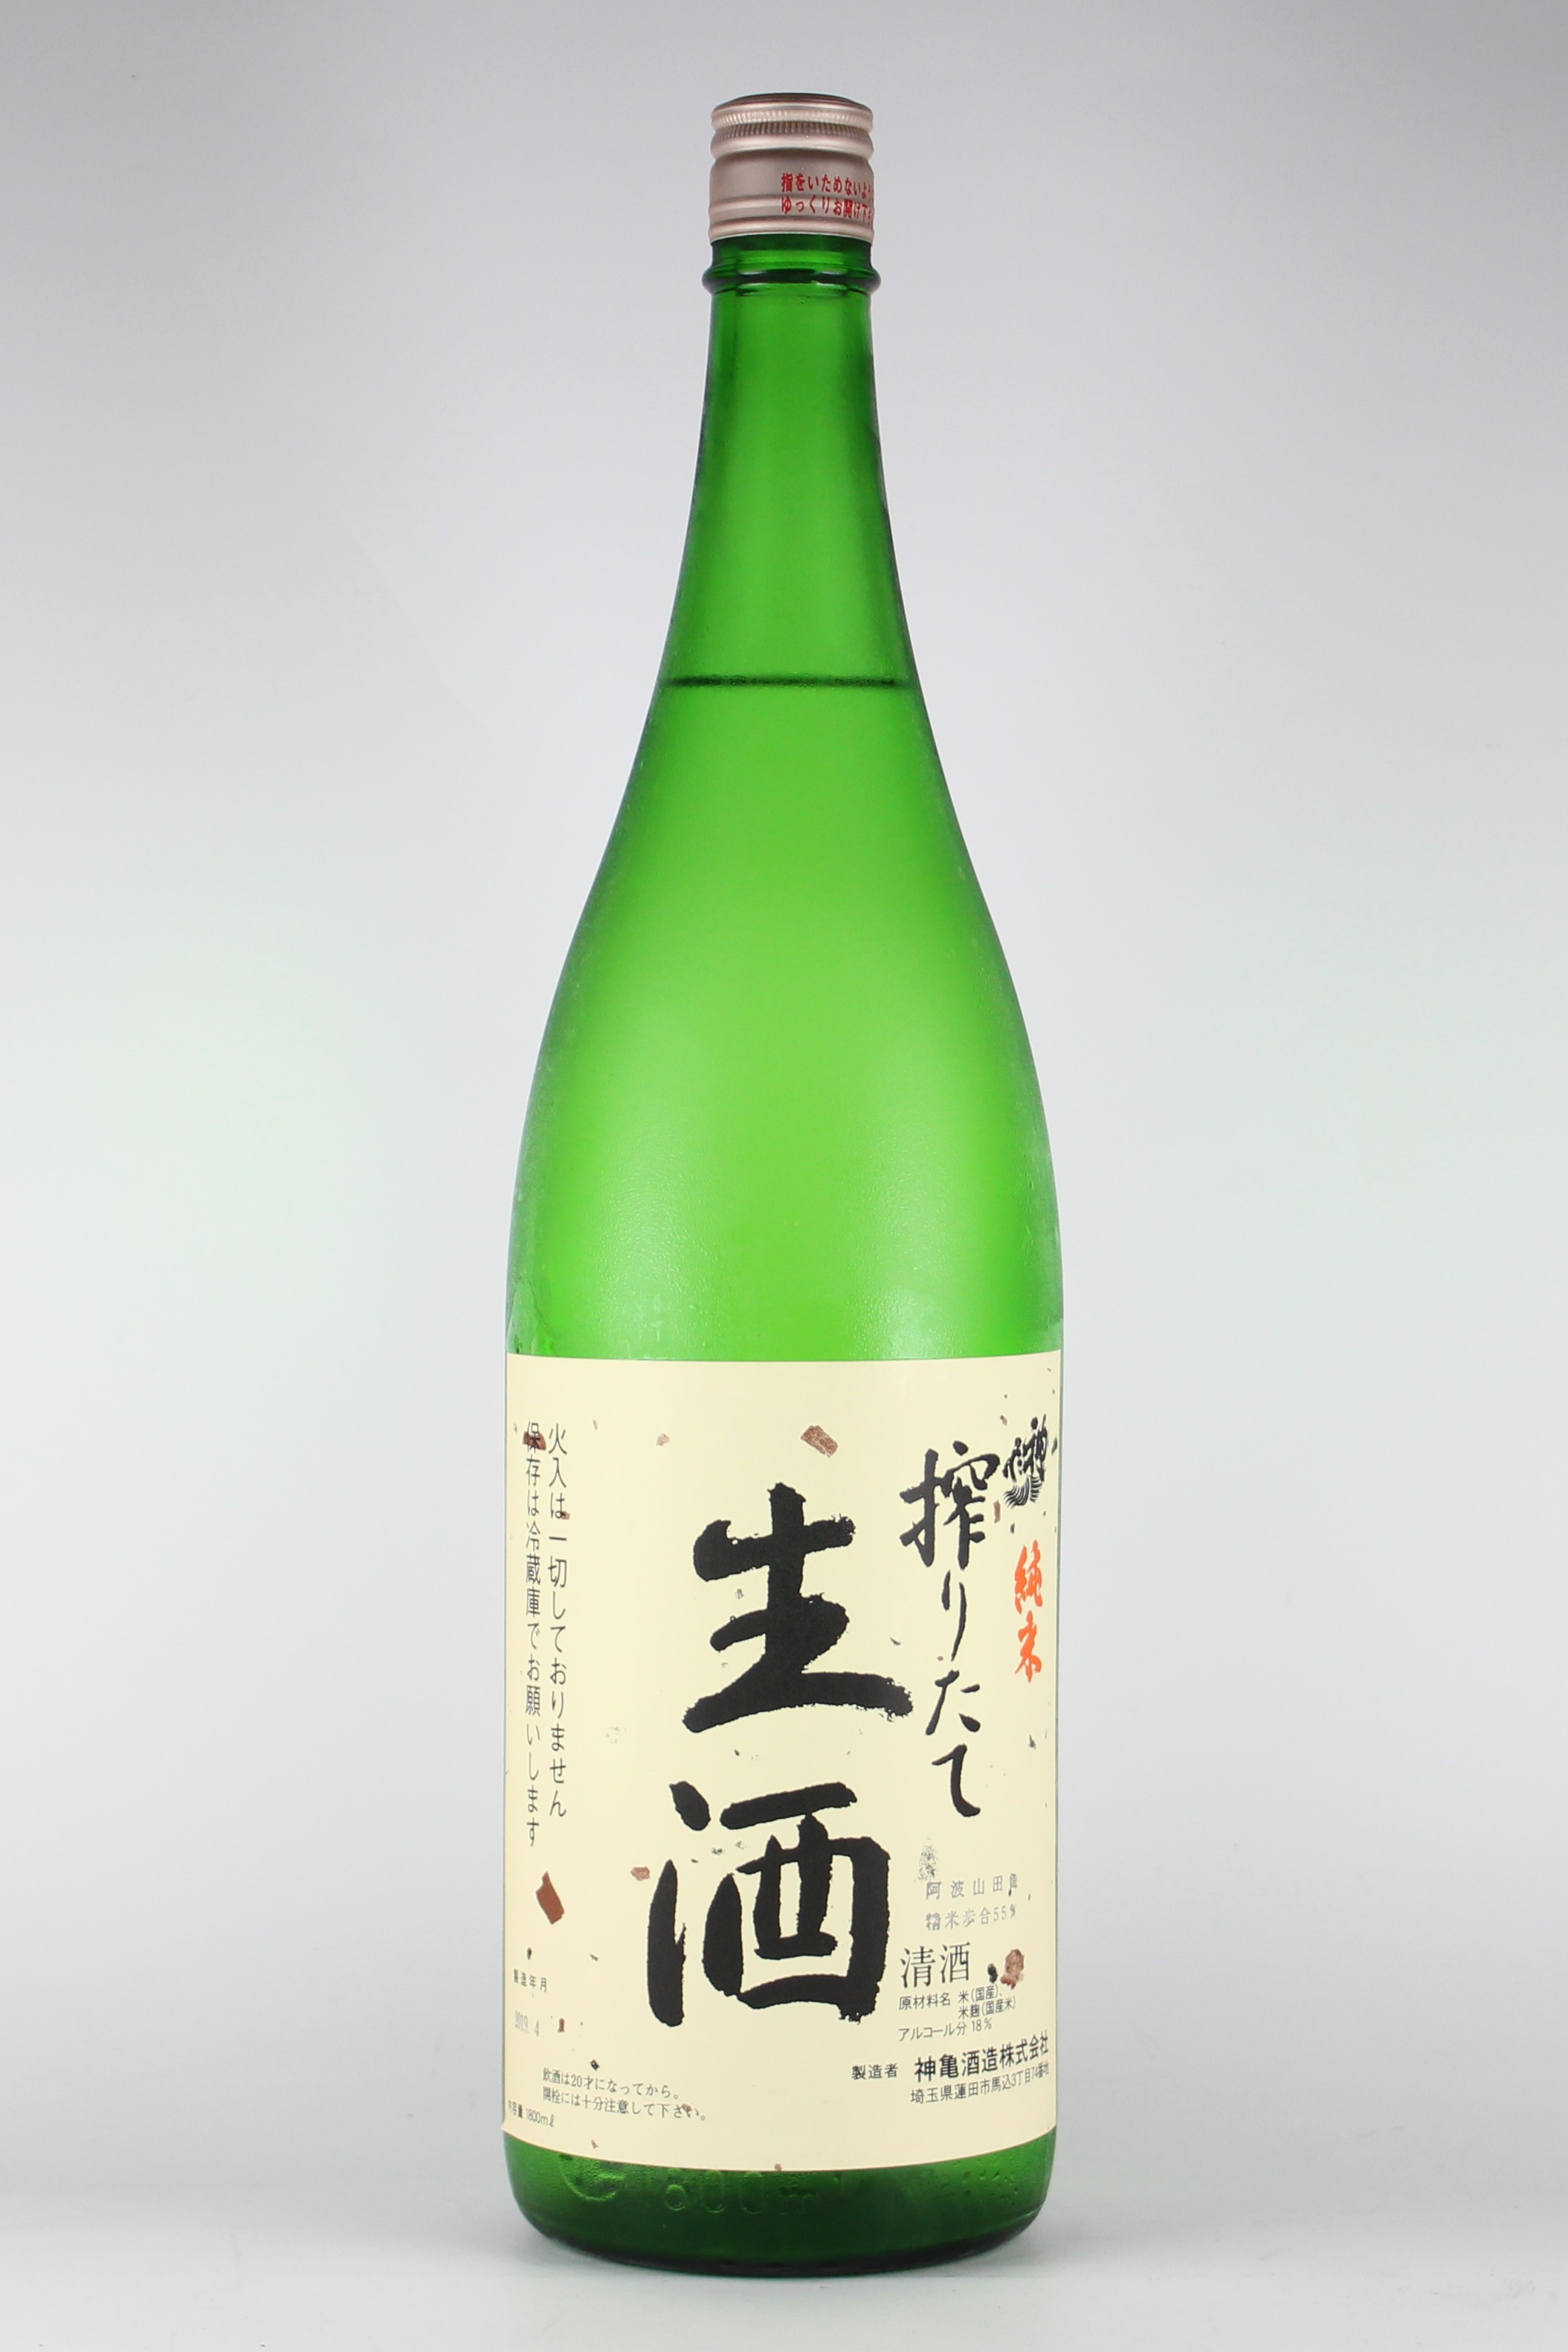 神亀 純米無濾過生原酒 搾りたて 1800ml 【埼玉/神亀酒造】